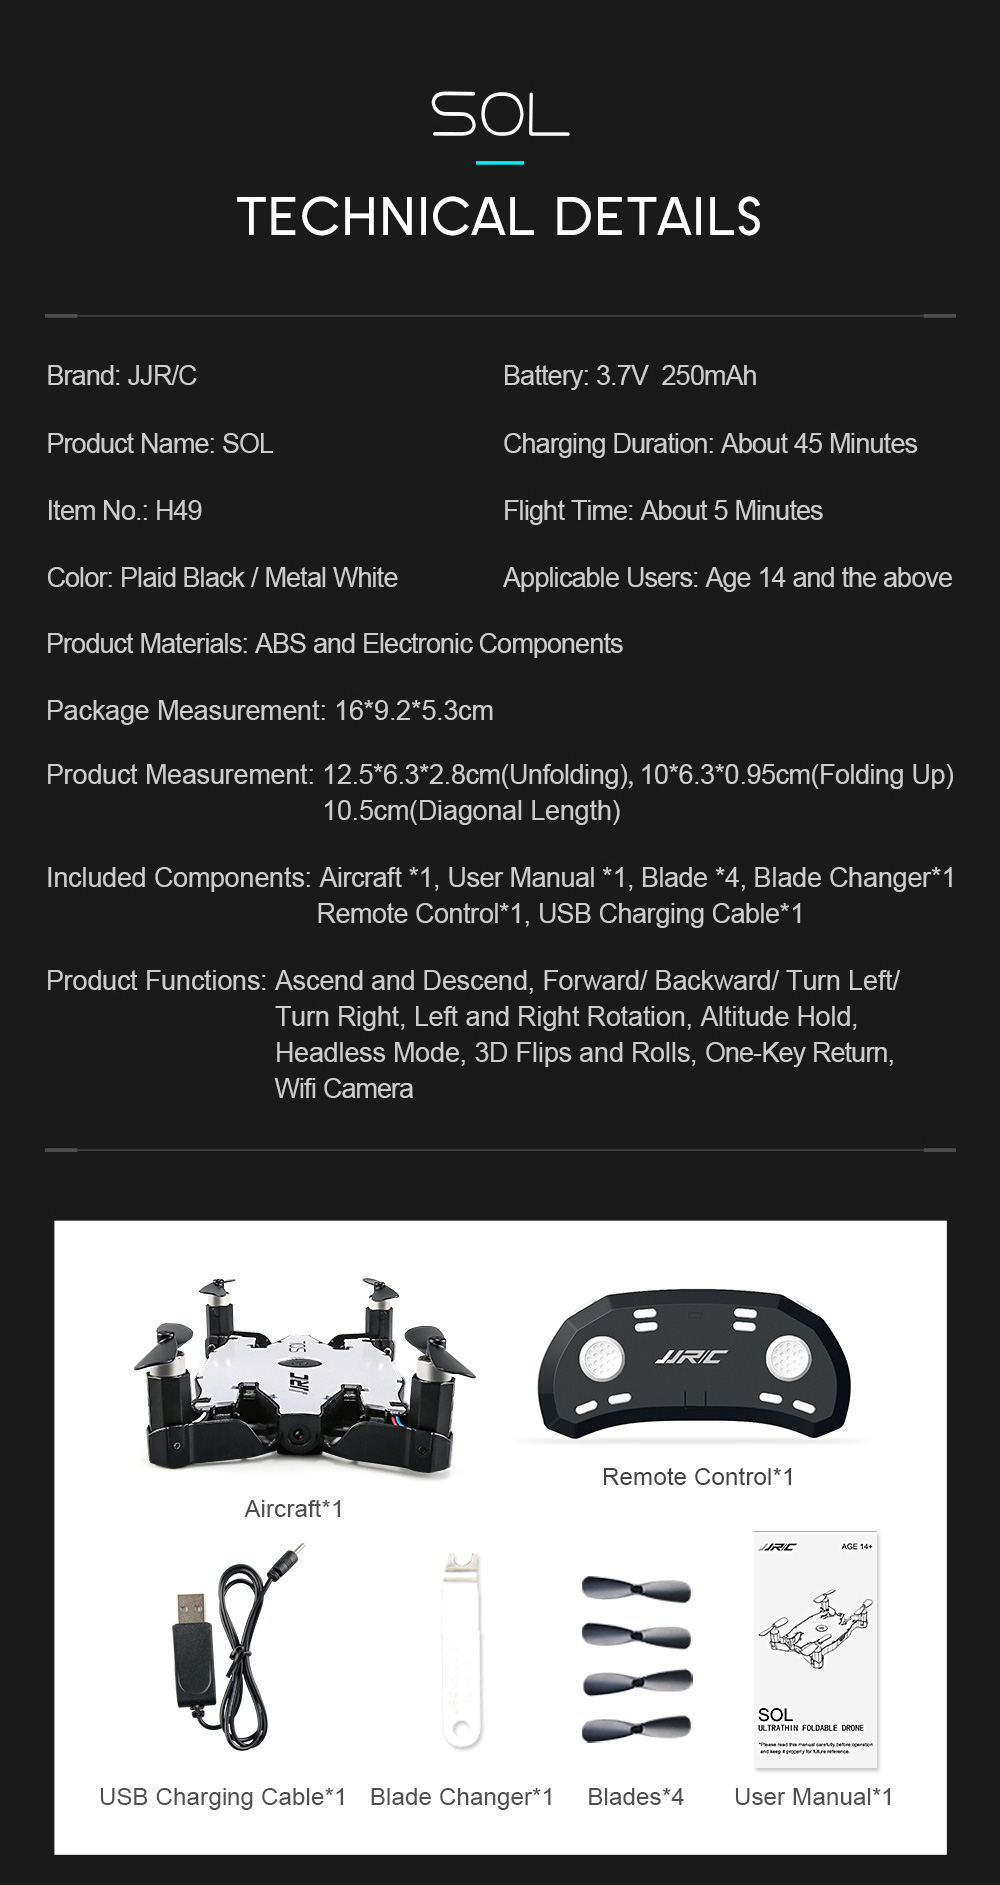 jjrc h49 sol mini foldable rc pocket selfie drone remote control